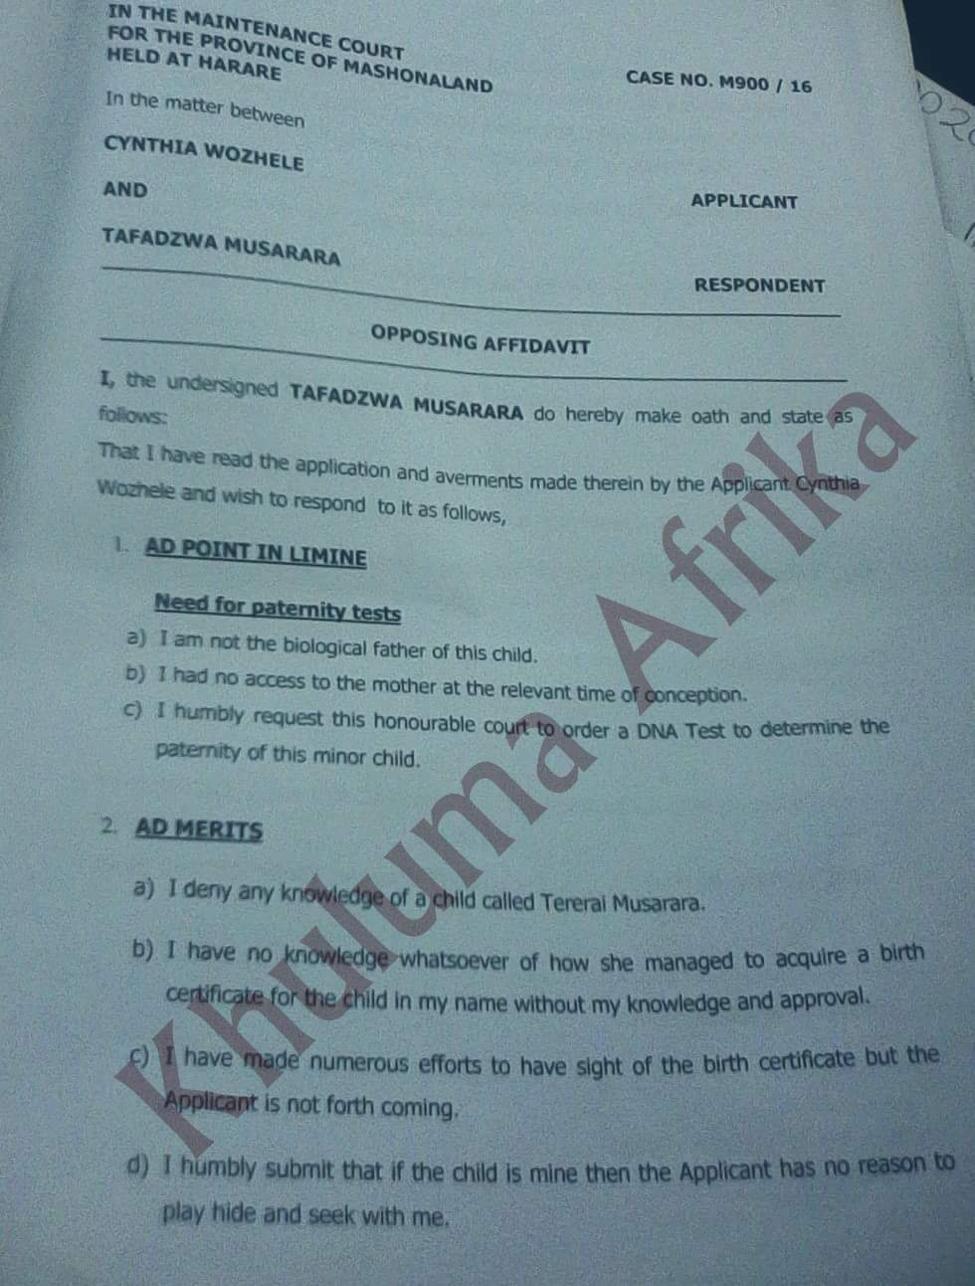 The opposing affidavit filed by Mr. Musarara